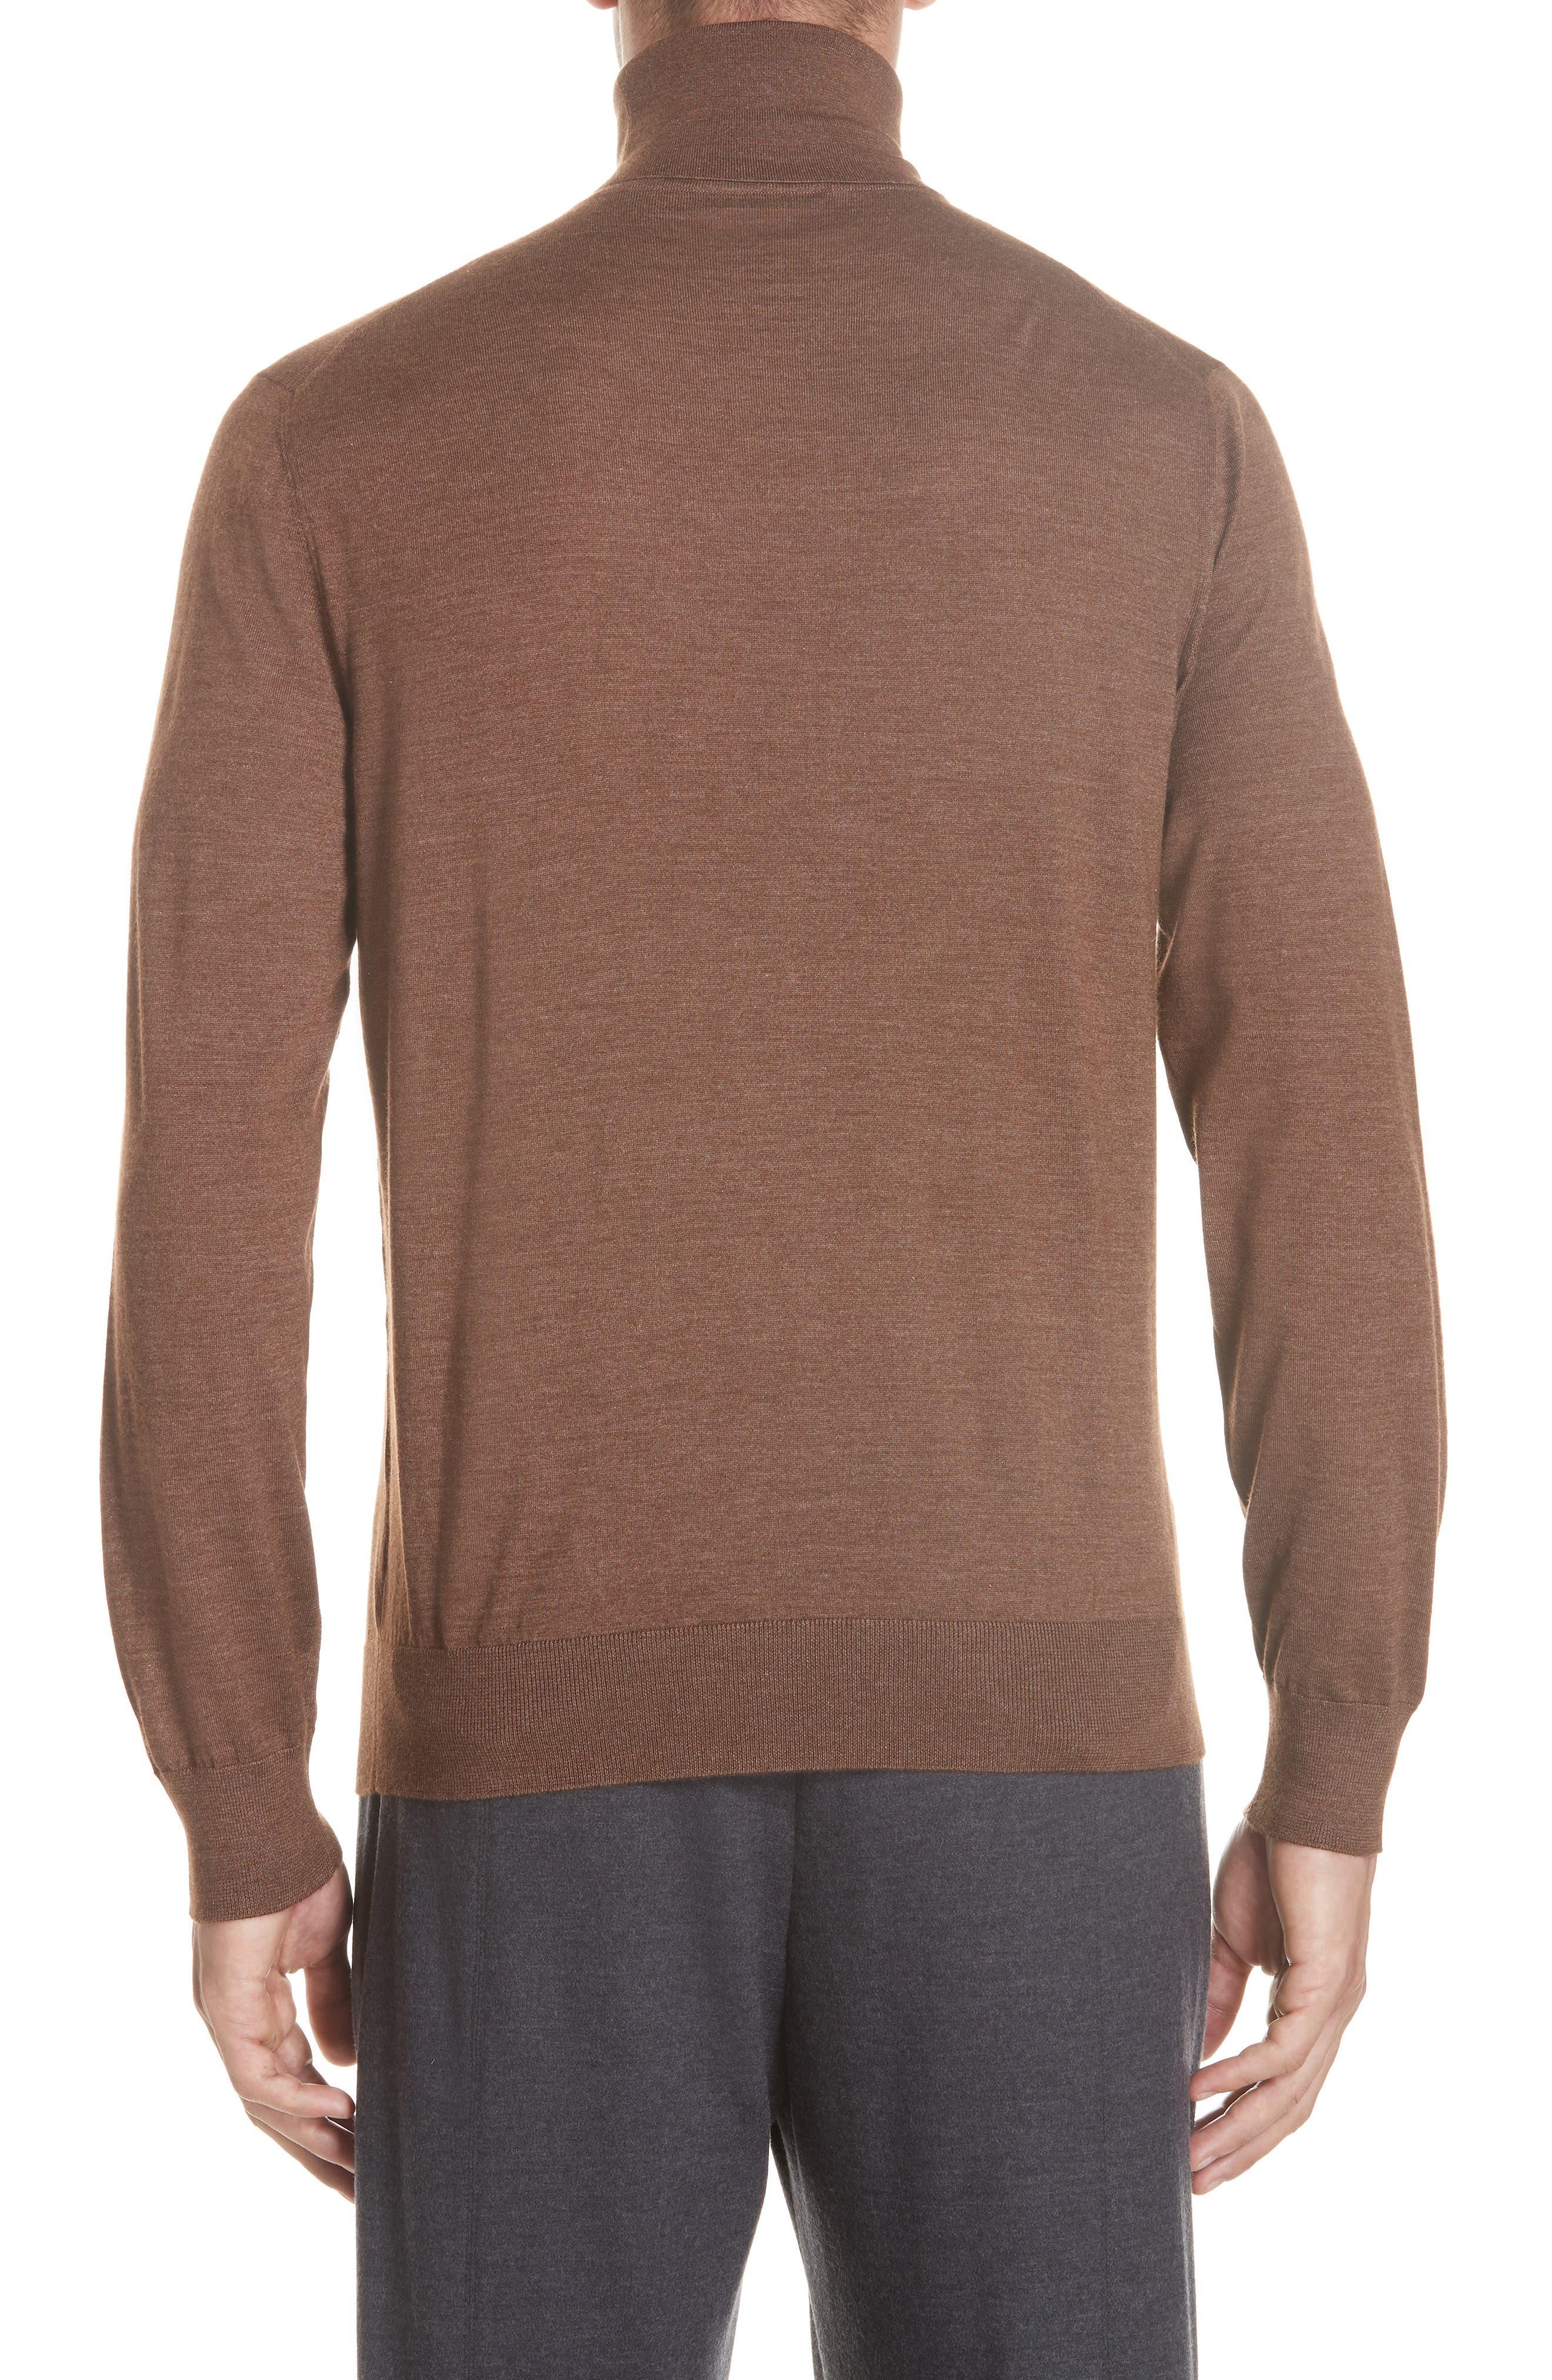 Cashmere & Silk Turtleneck Sweater,                             Alternate thumbnail 2, color,                             252